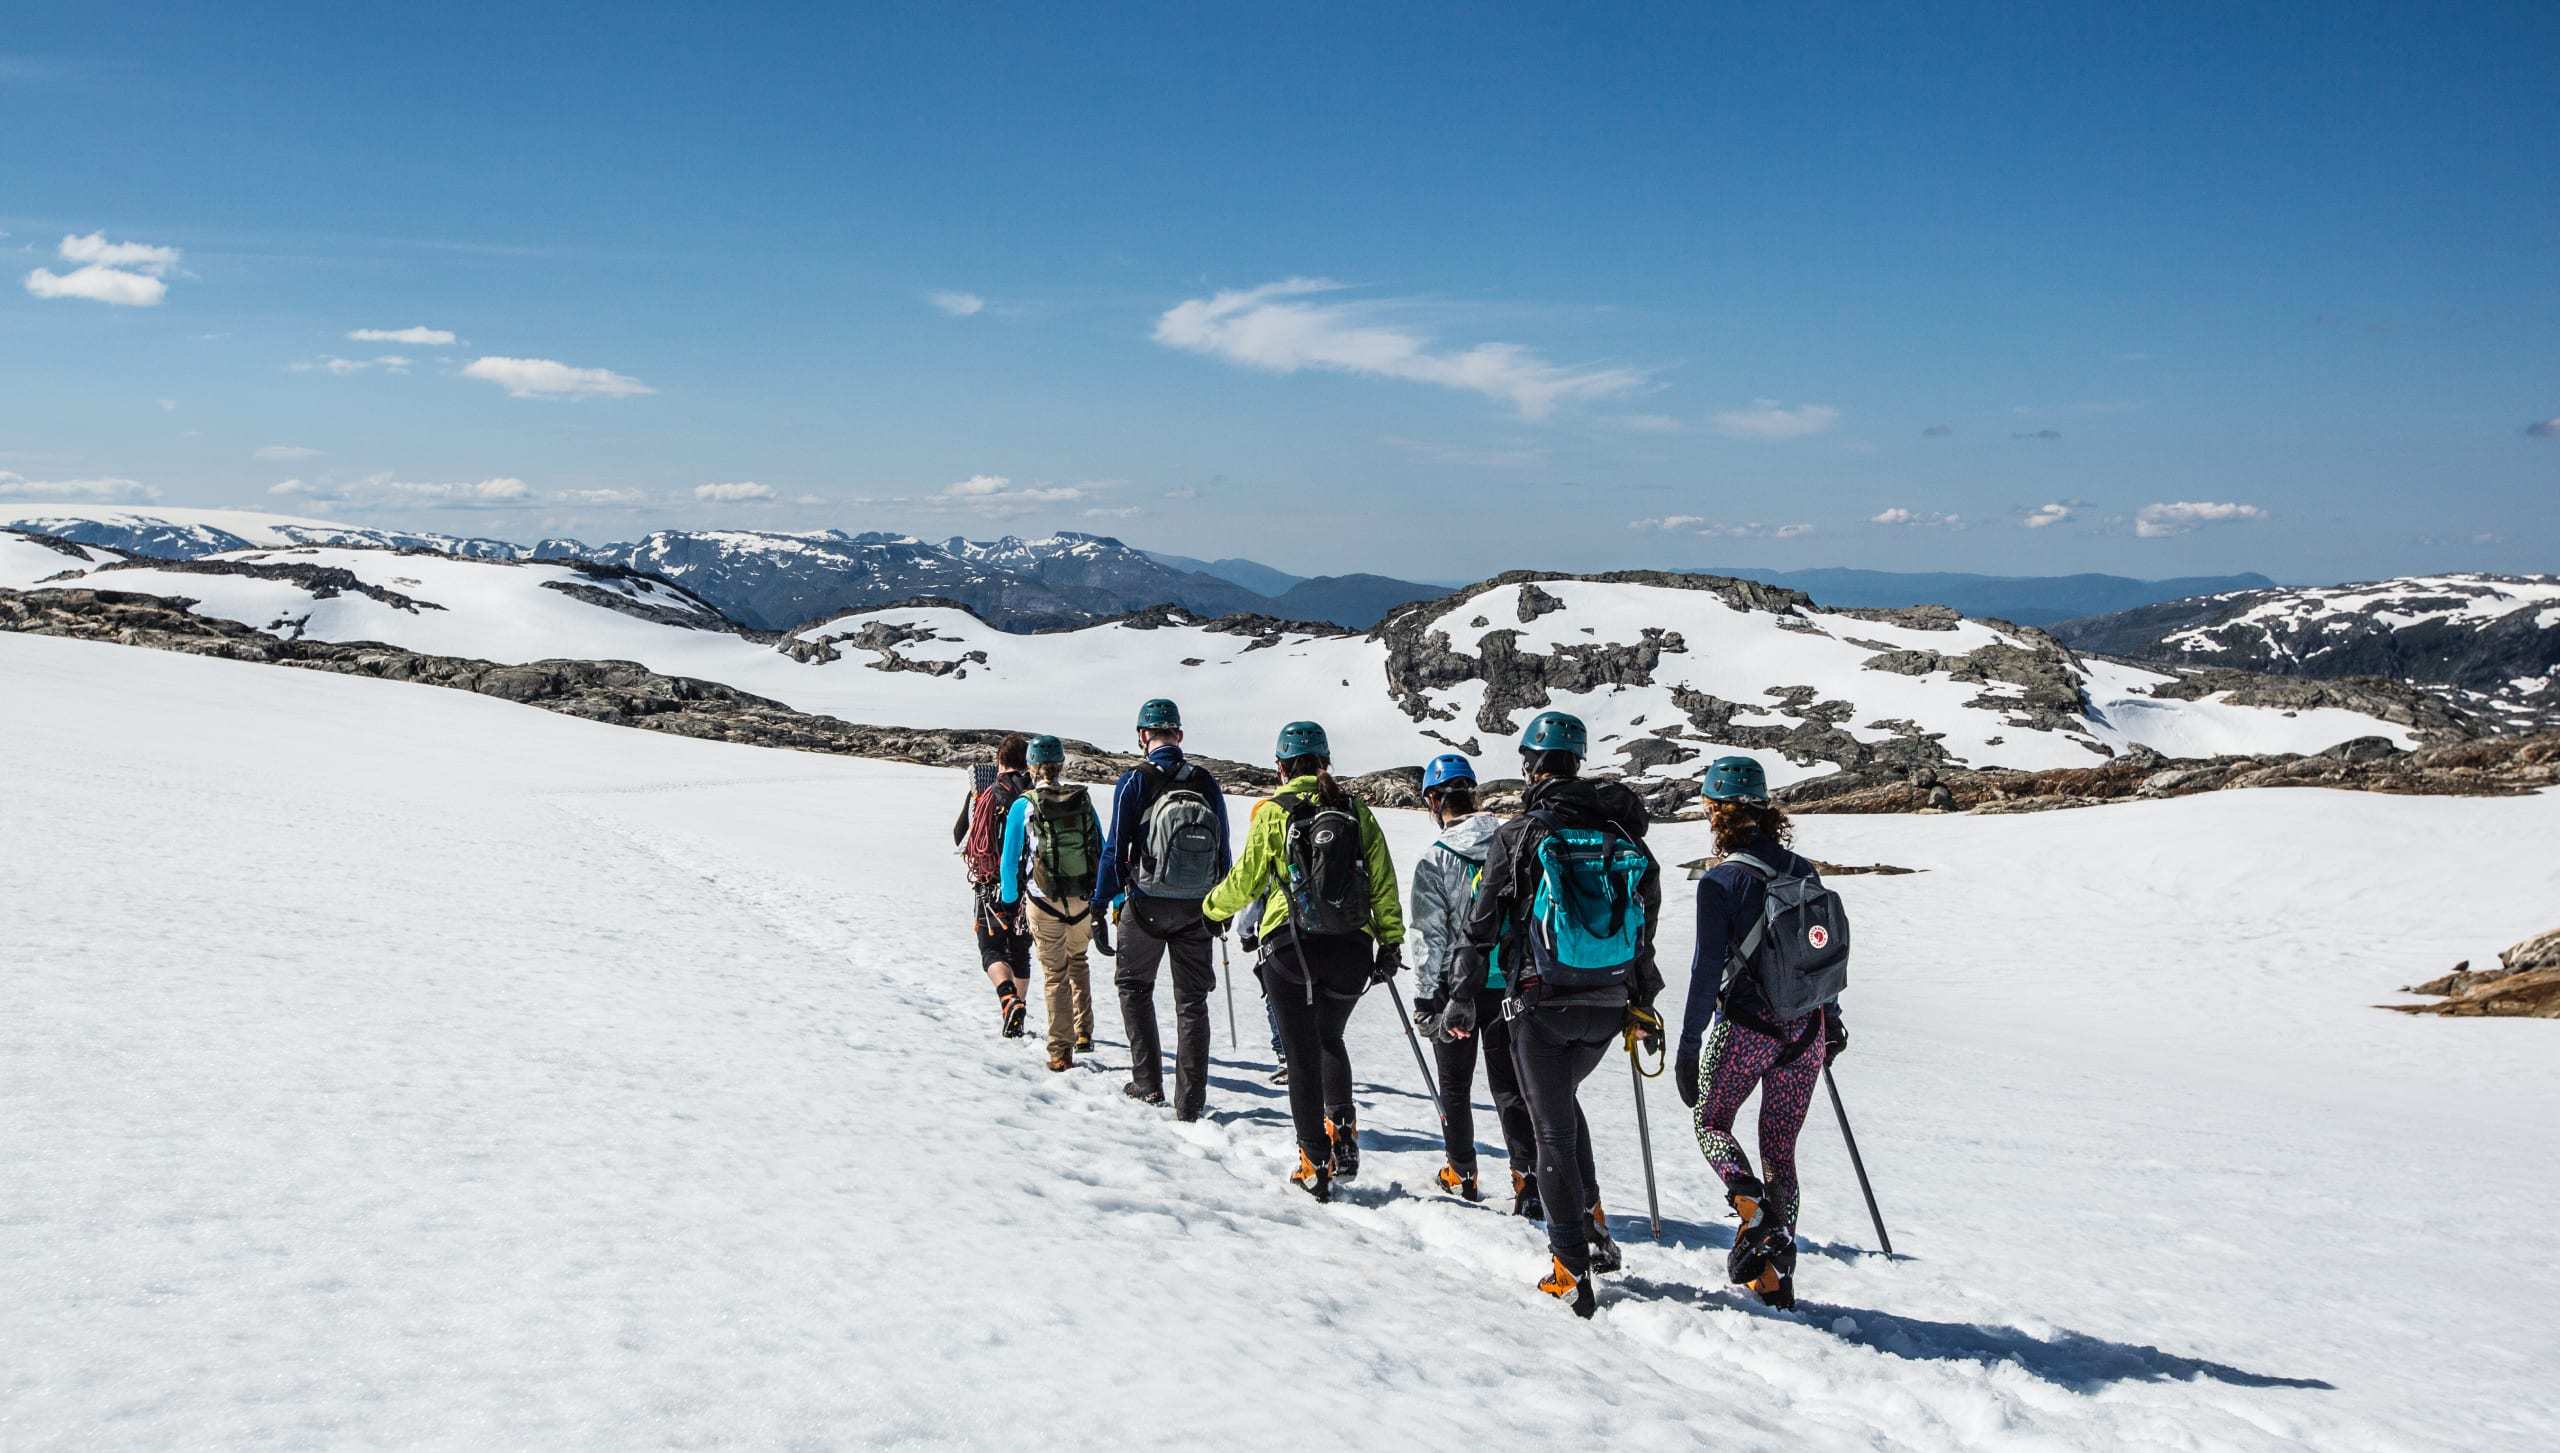 Glacier hiking at Folgefonna